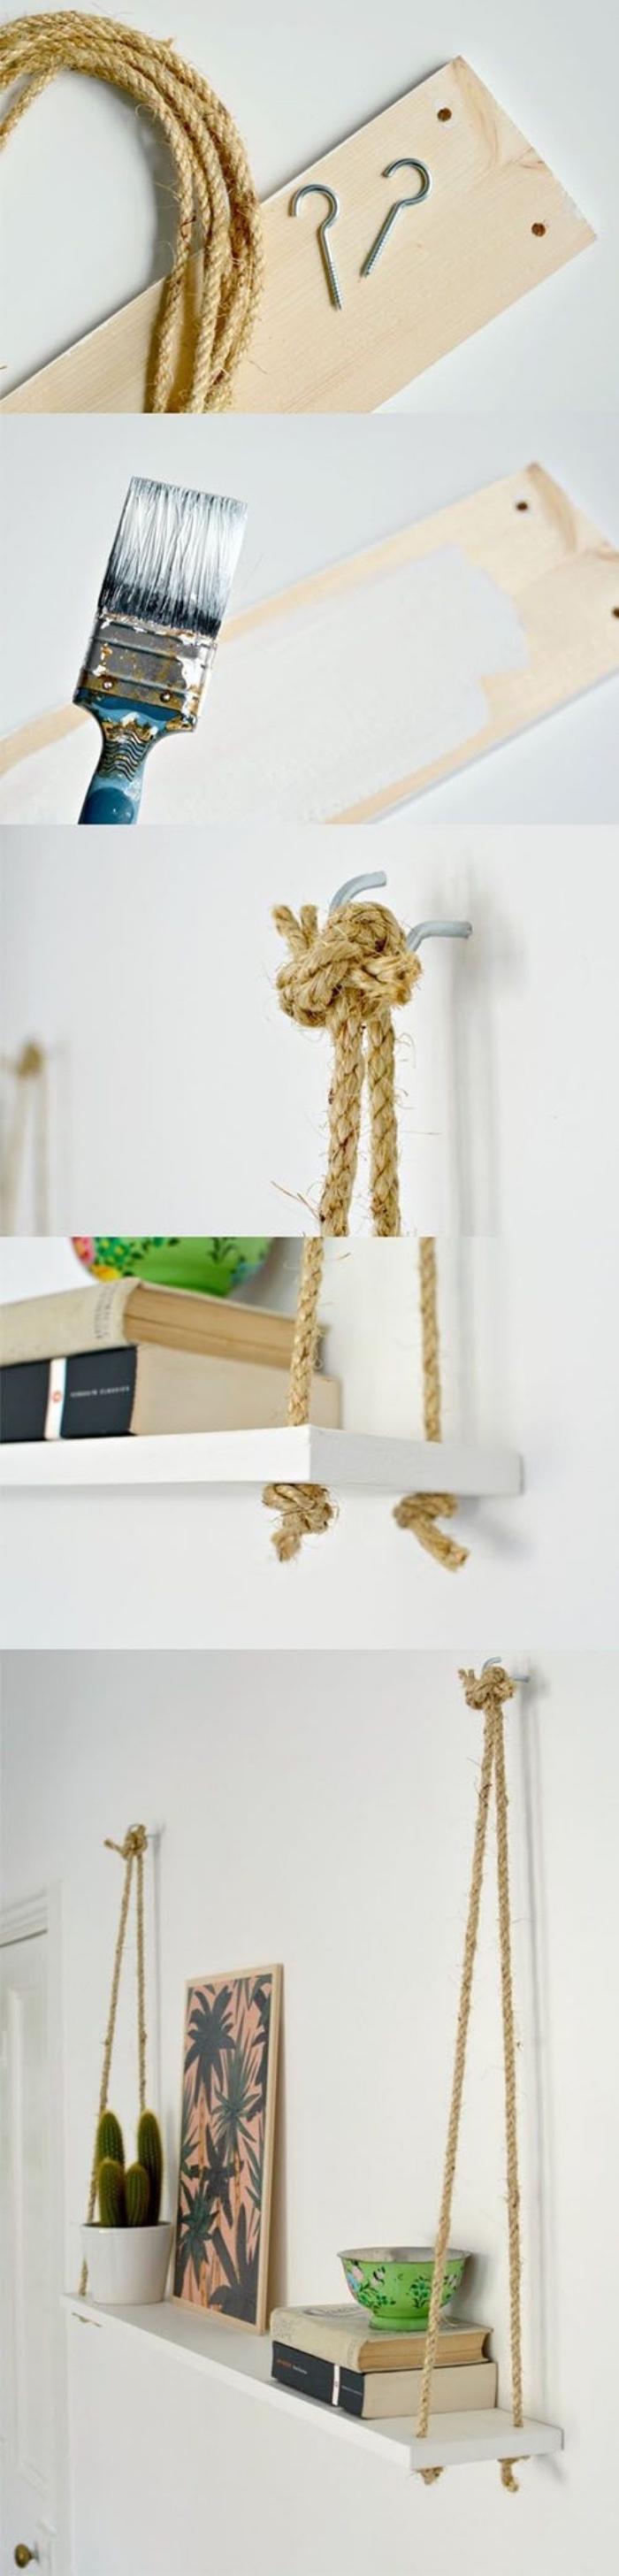 idees de rangement astucieux full size of modernes fr frache rangement astucieux idees. Black Bedroom Furniture Sets. Home Design Ideas